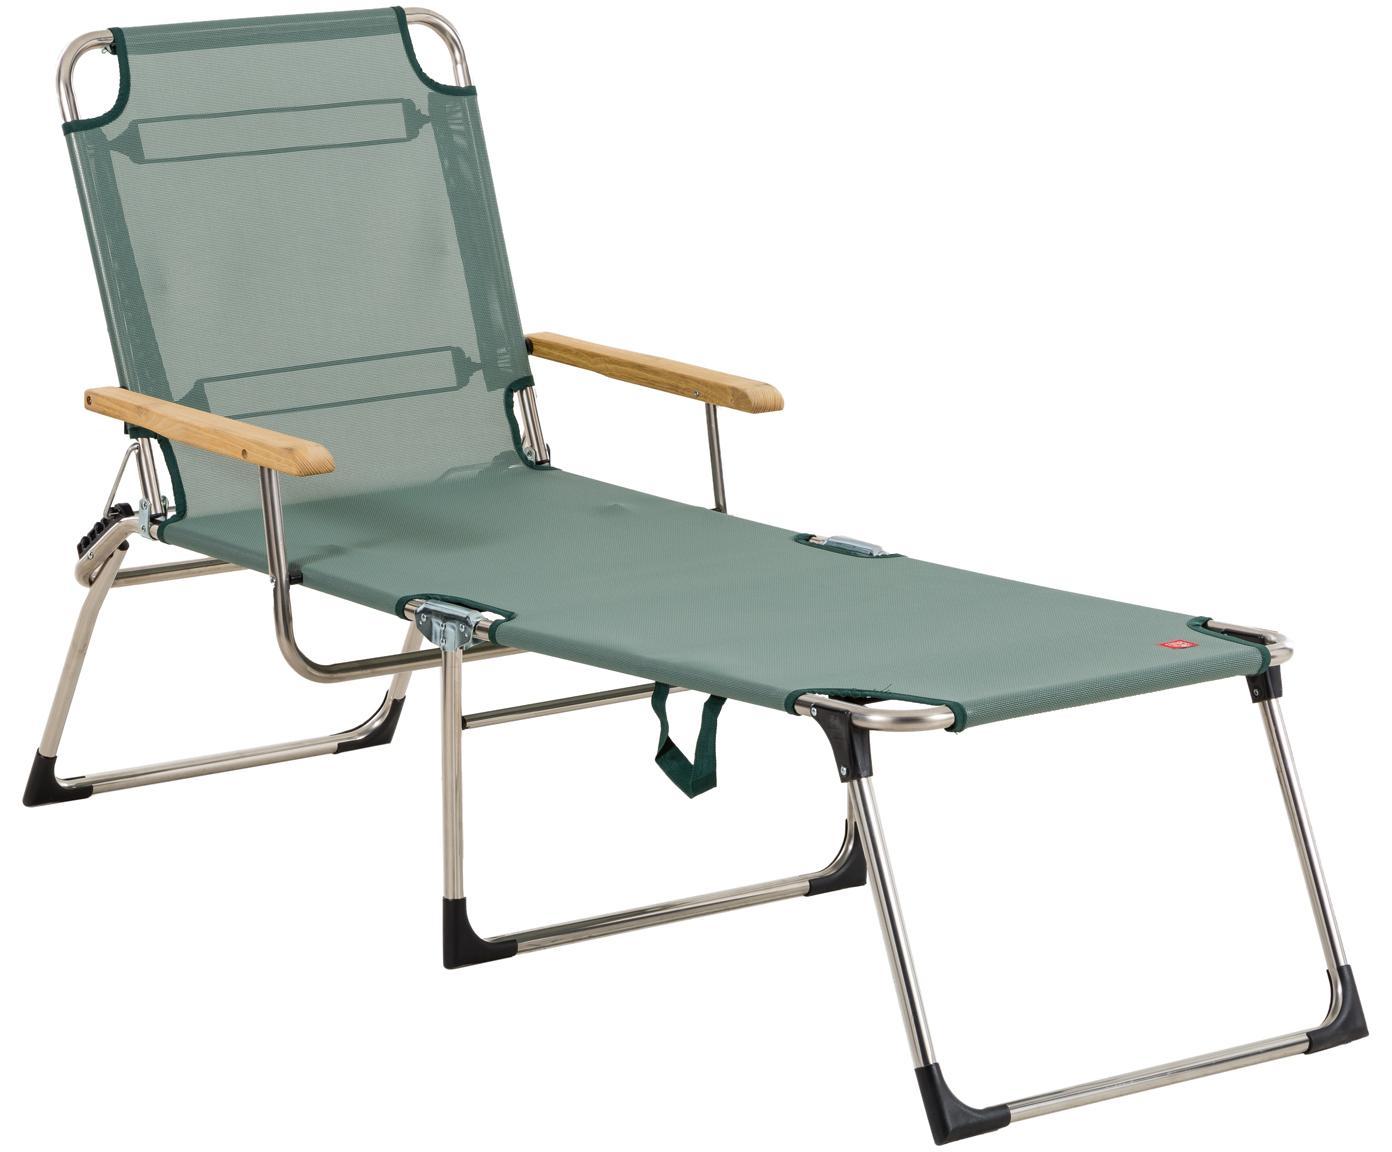 Outdoor ligstoel Amigo, Frame: aluminium, Bekleding: kunststofweefsel (weer- e, Armleuning: natuurlijk robiniahout, Saliegroen, robiniahoutkleurig, B 190 x D 69 cm